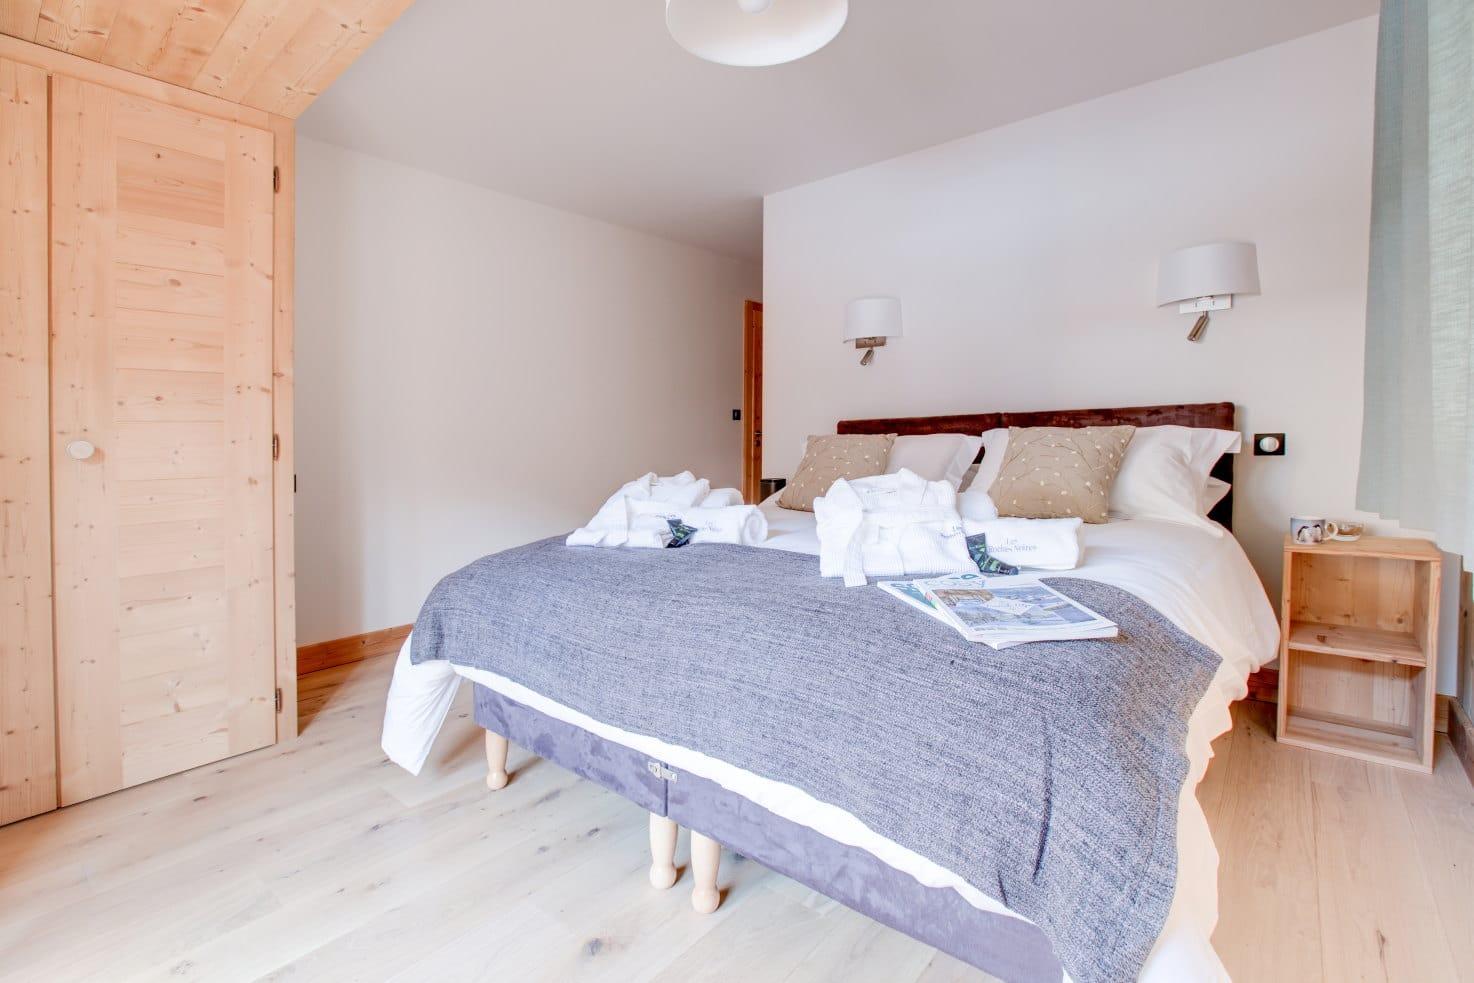 Chalet Les Roches Noires Bedroom